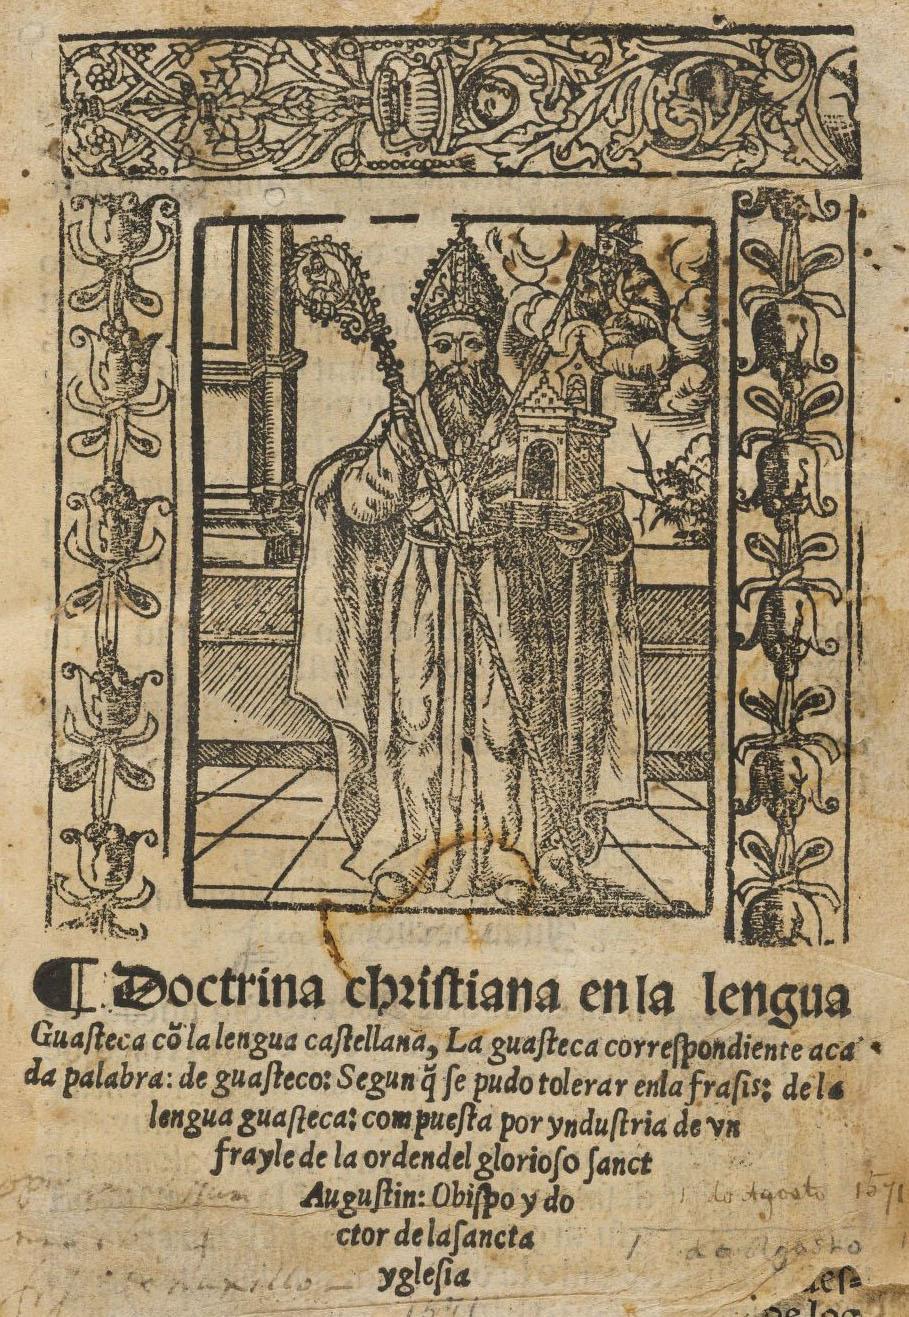 Juan de la Cruz, Augustinian.  Doctrina christiana en la lengua guasteca co[n] la lengua castellana, 1571. LMC5 J8703 571d